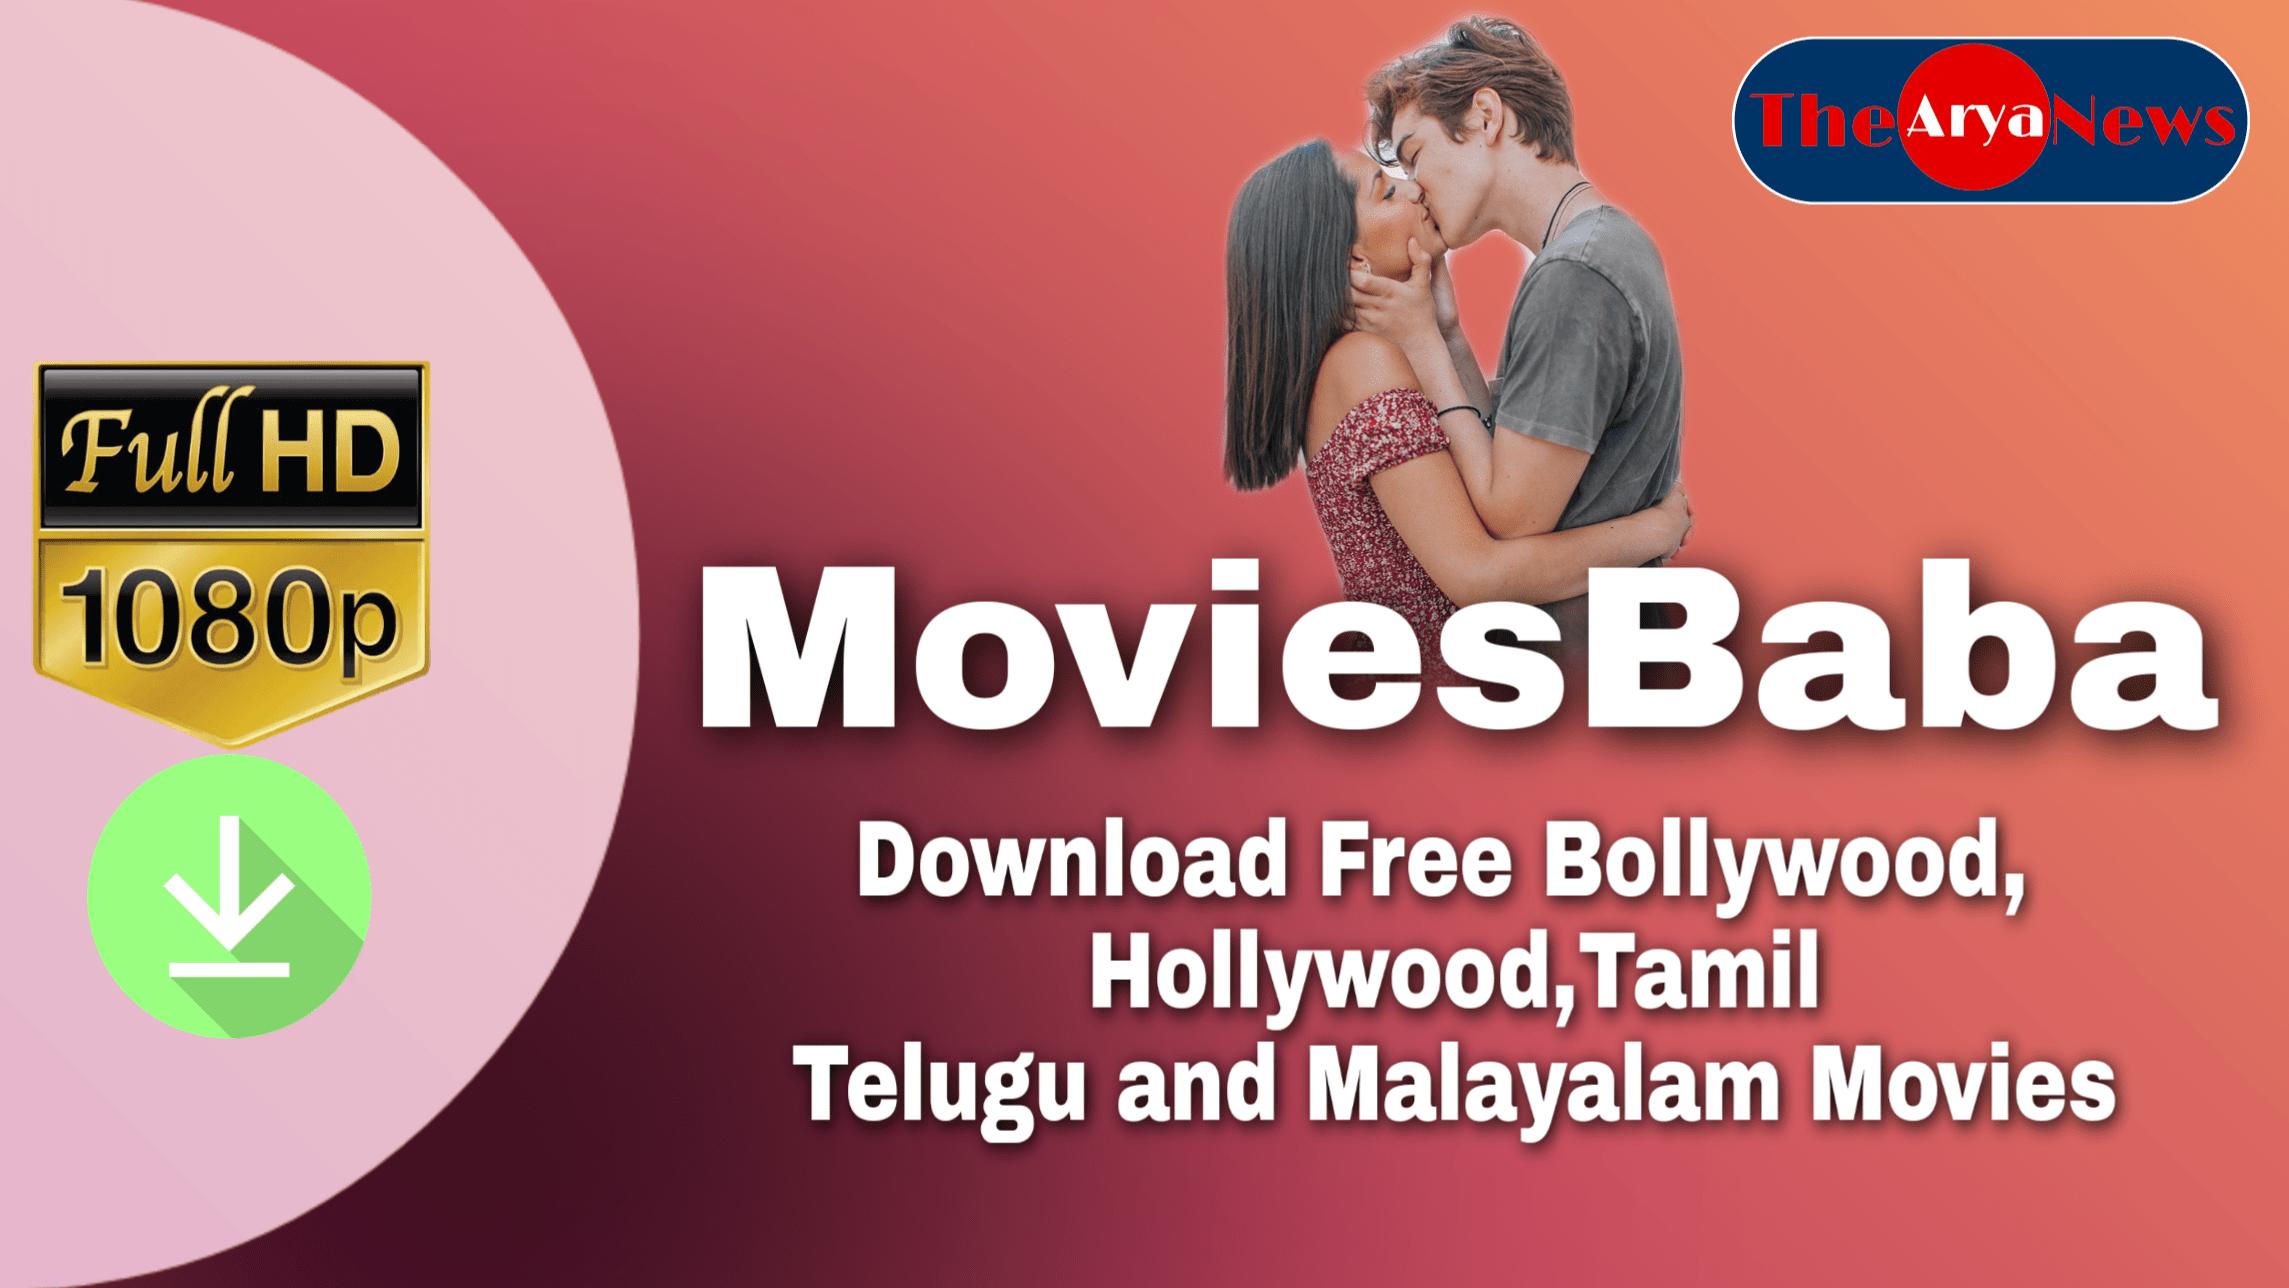 MoviesBaba (2020) Download Movies, TV Shows Online Watch